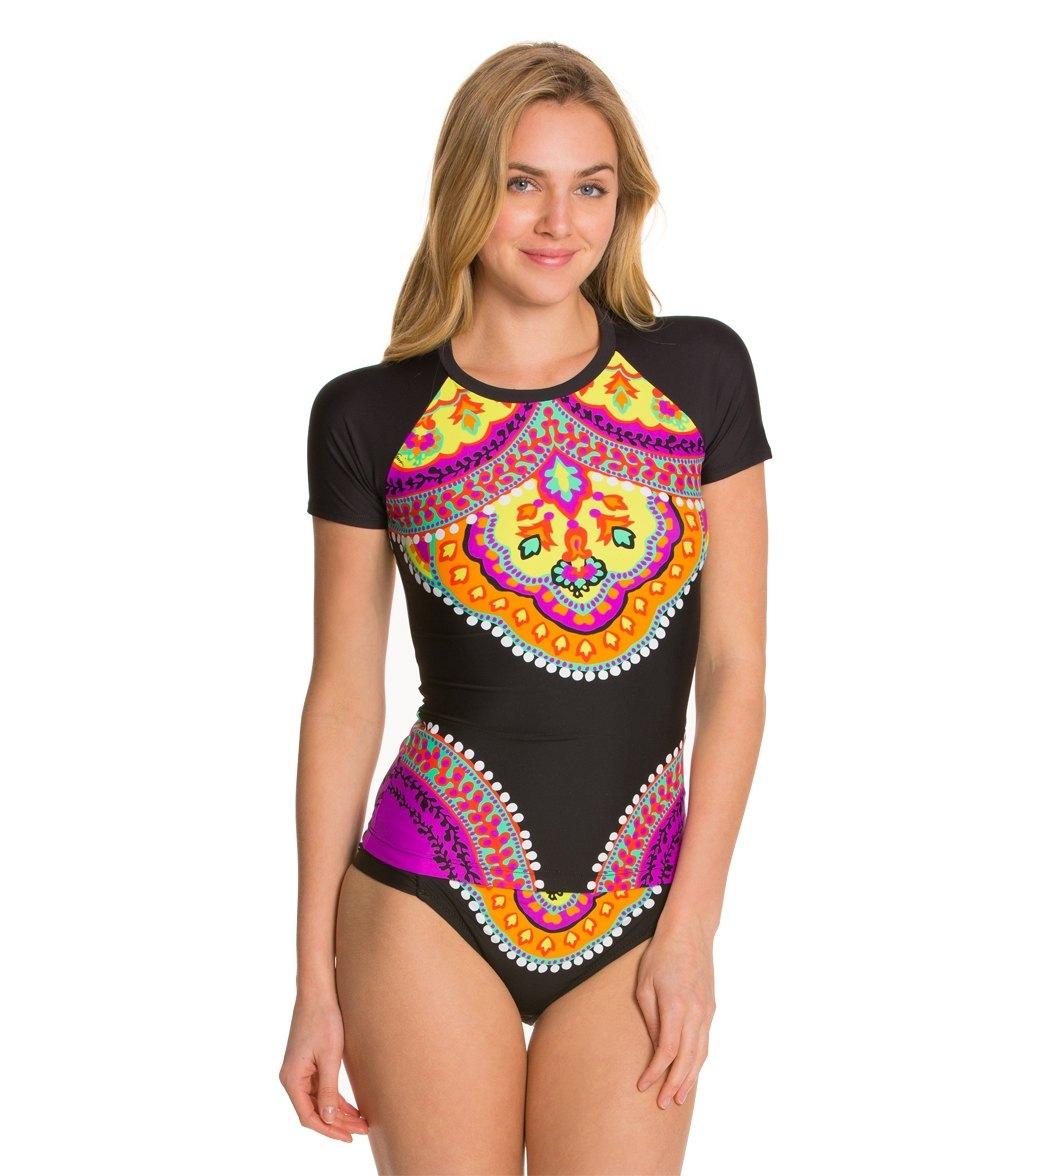 ed7927bc14 Trina Turk Nuevo Sol Covers S/S Rashguard at SwimOutlet.com - Free ...